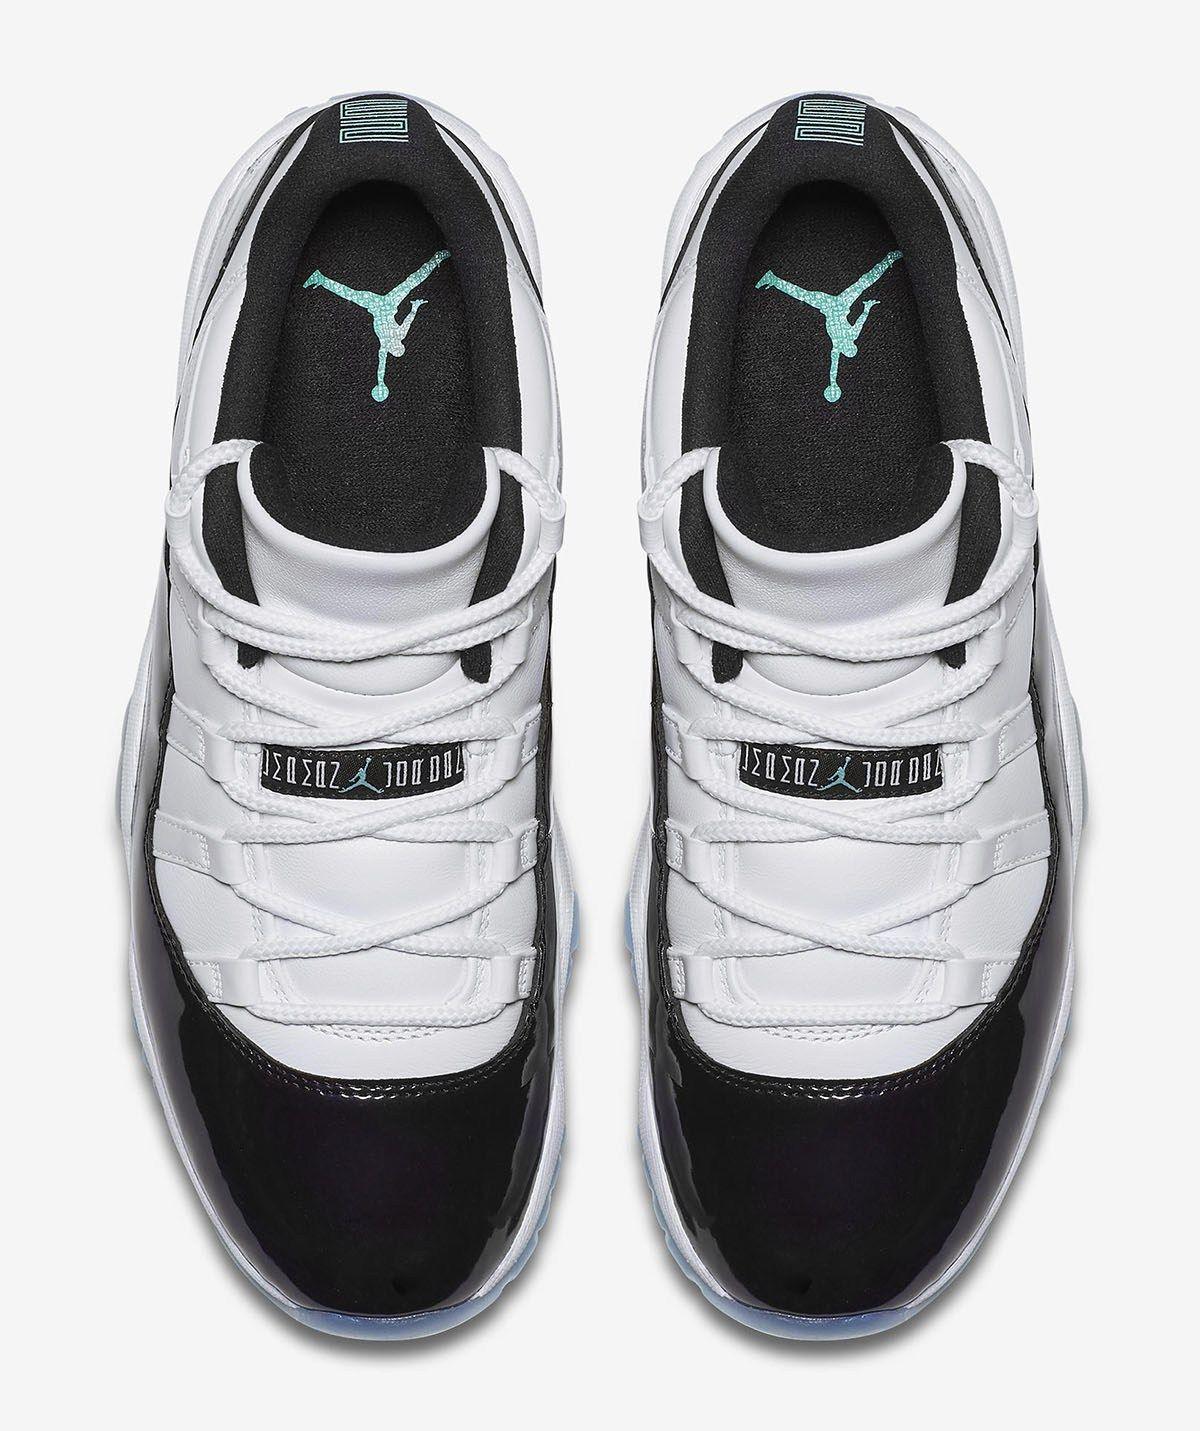 brand new 9898f 742eb Air Jordan 11 Retro Low